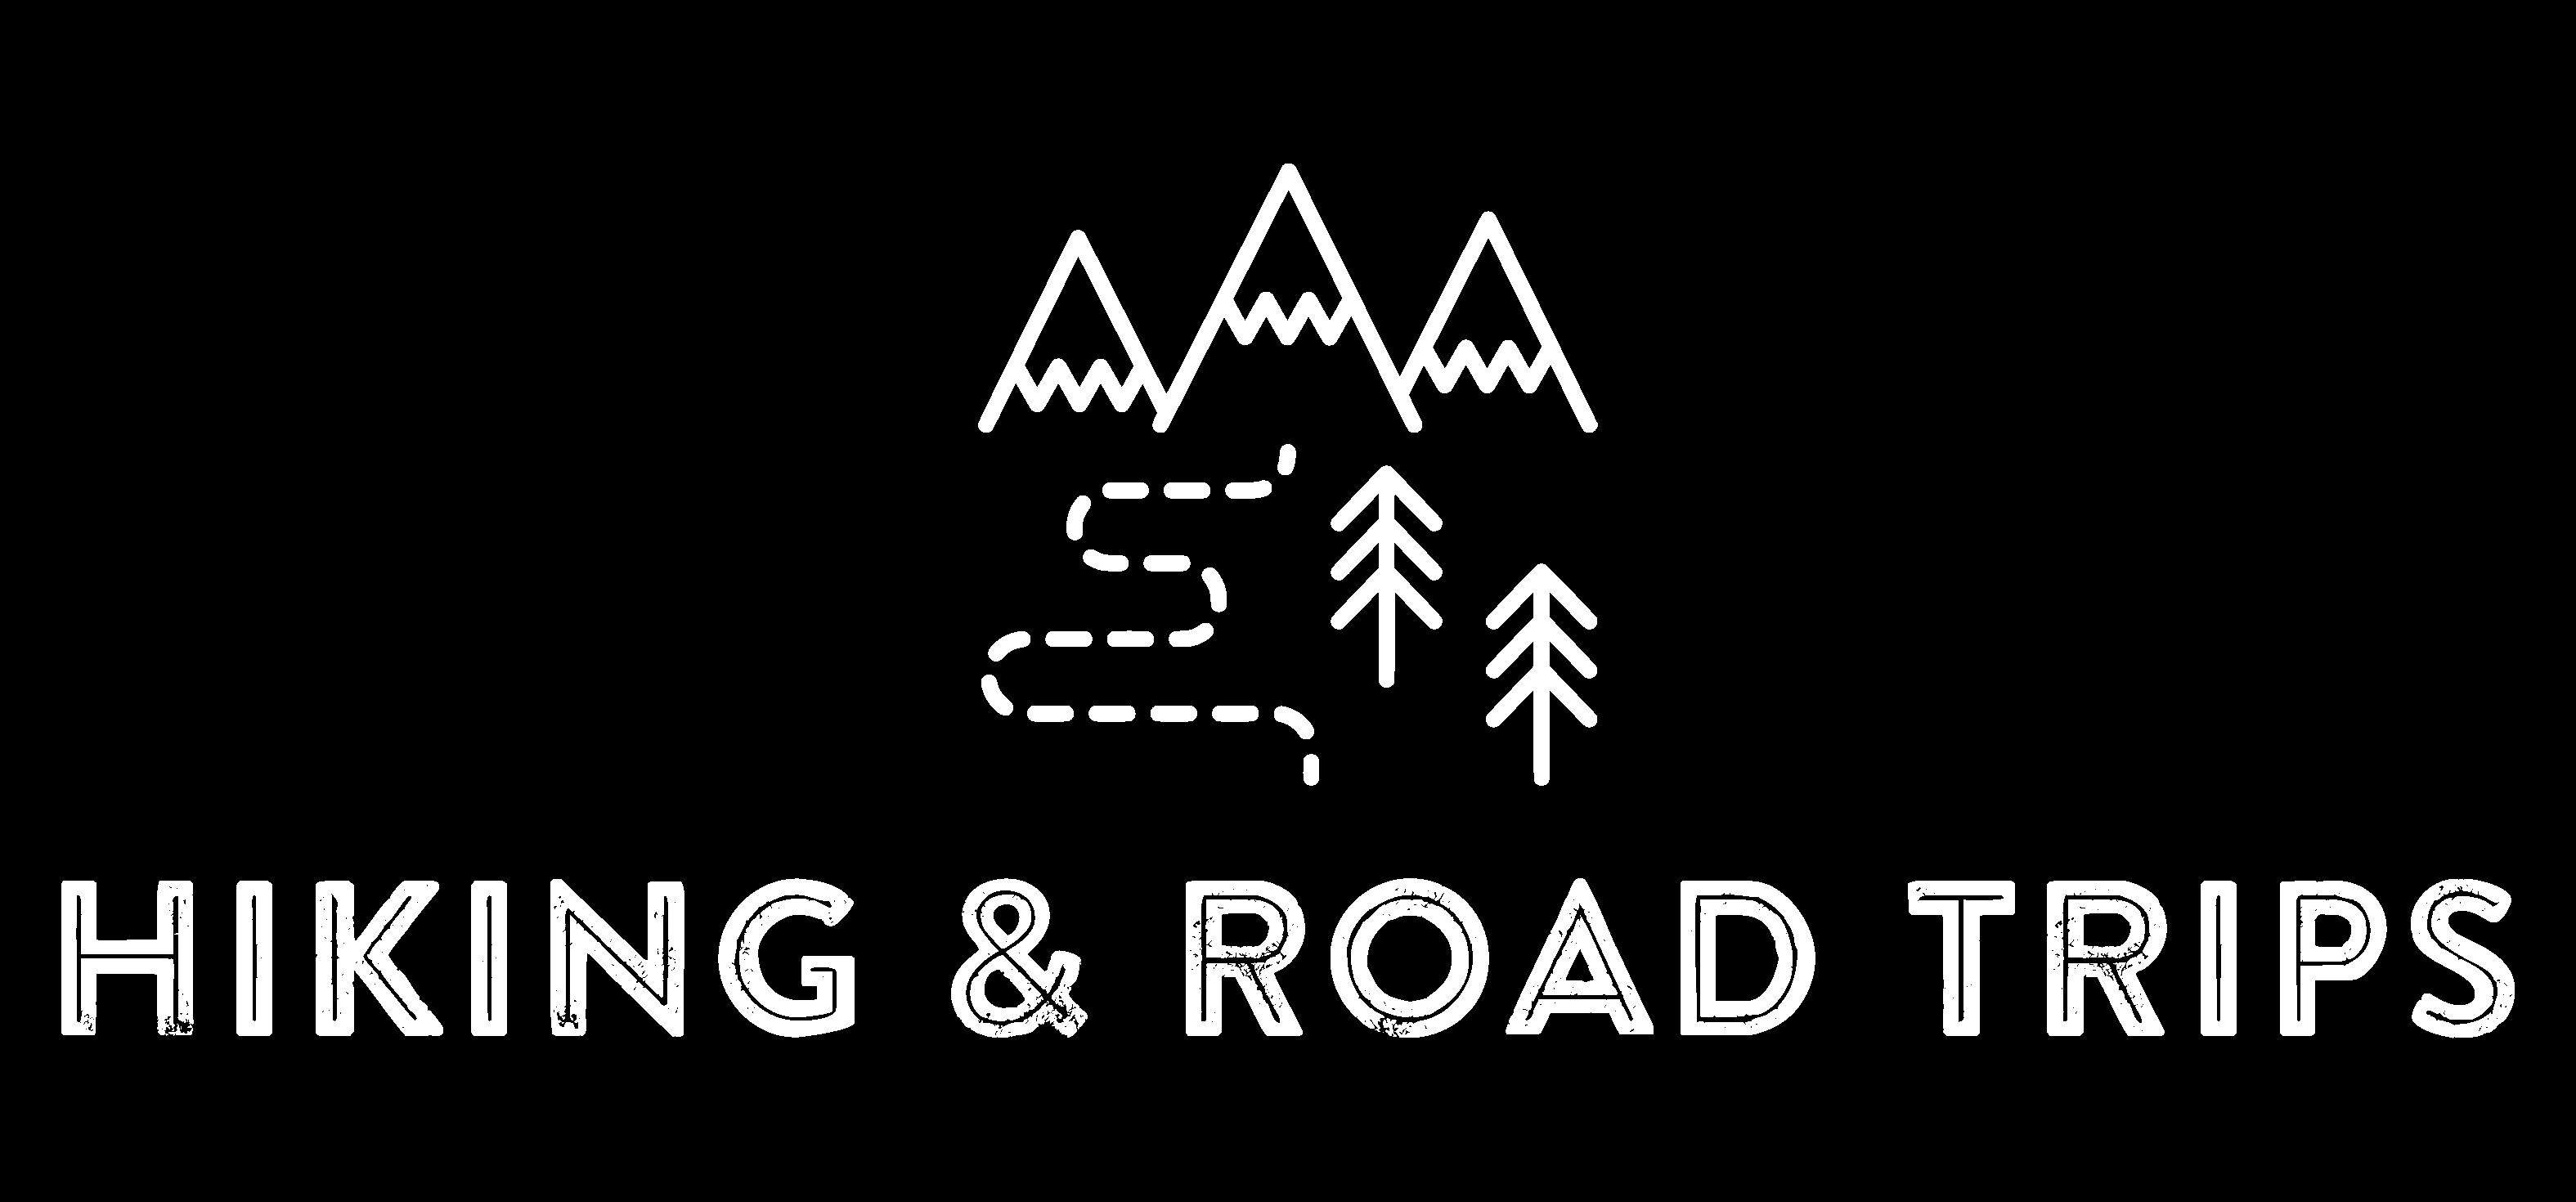 Hiking & Road Trips